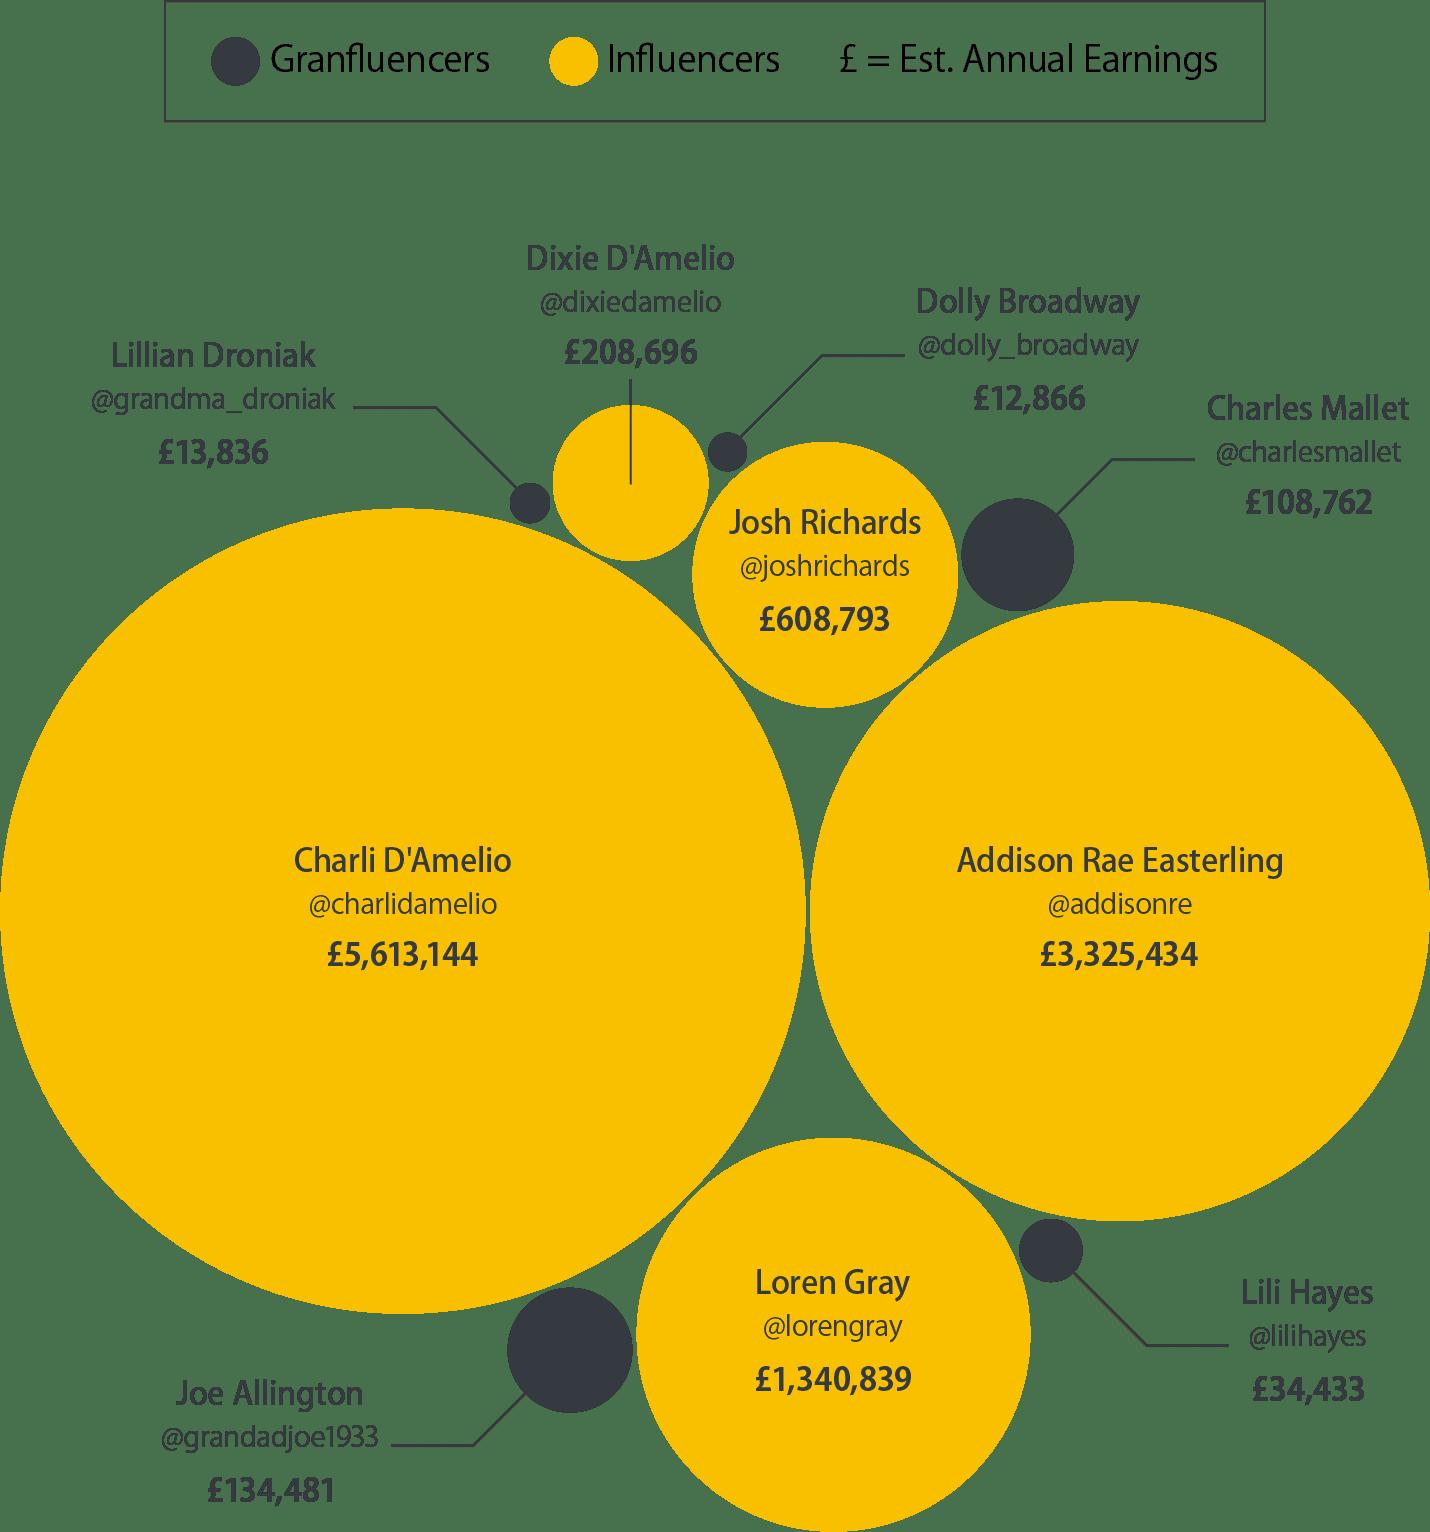 "Graphic that shows ""The five highest-earning TikTok influencers versus TikTok Granfluencers"